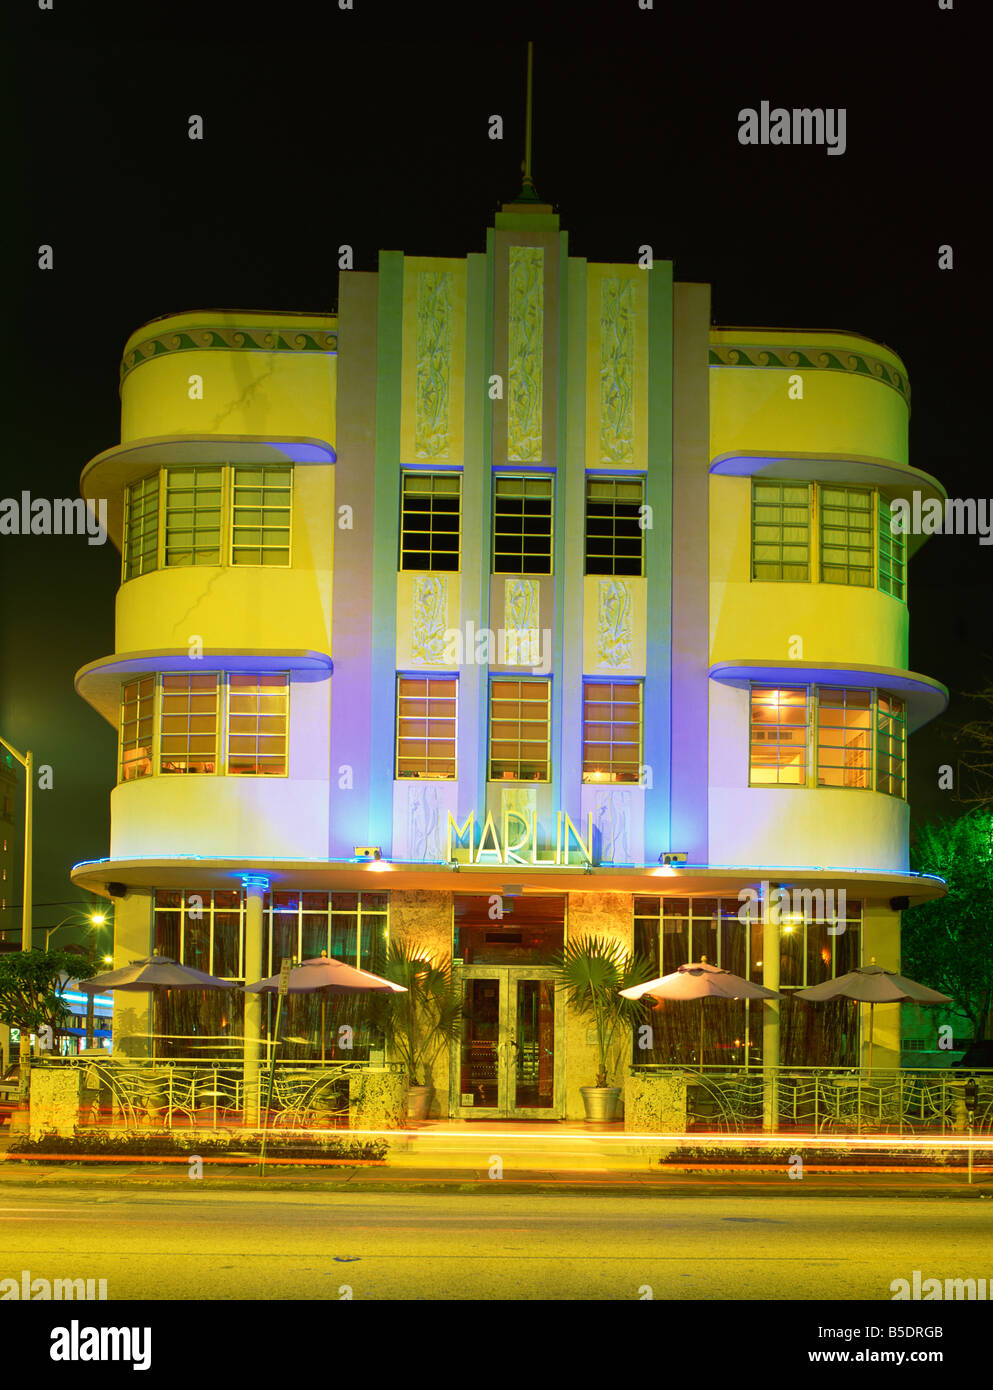 the marlin hotel illuminated at night ocean drive art deco district